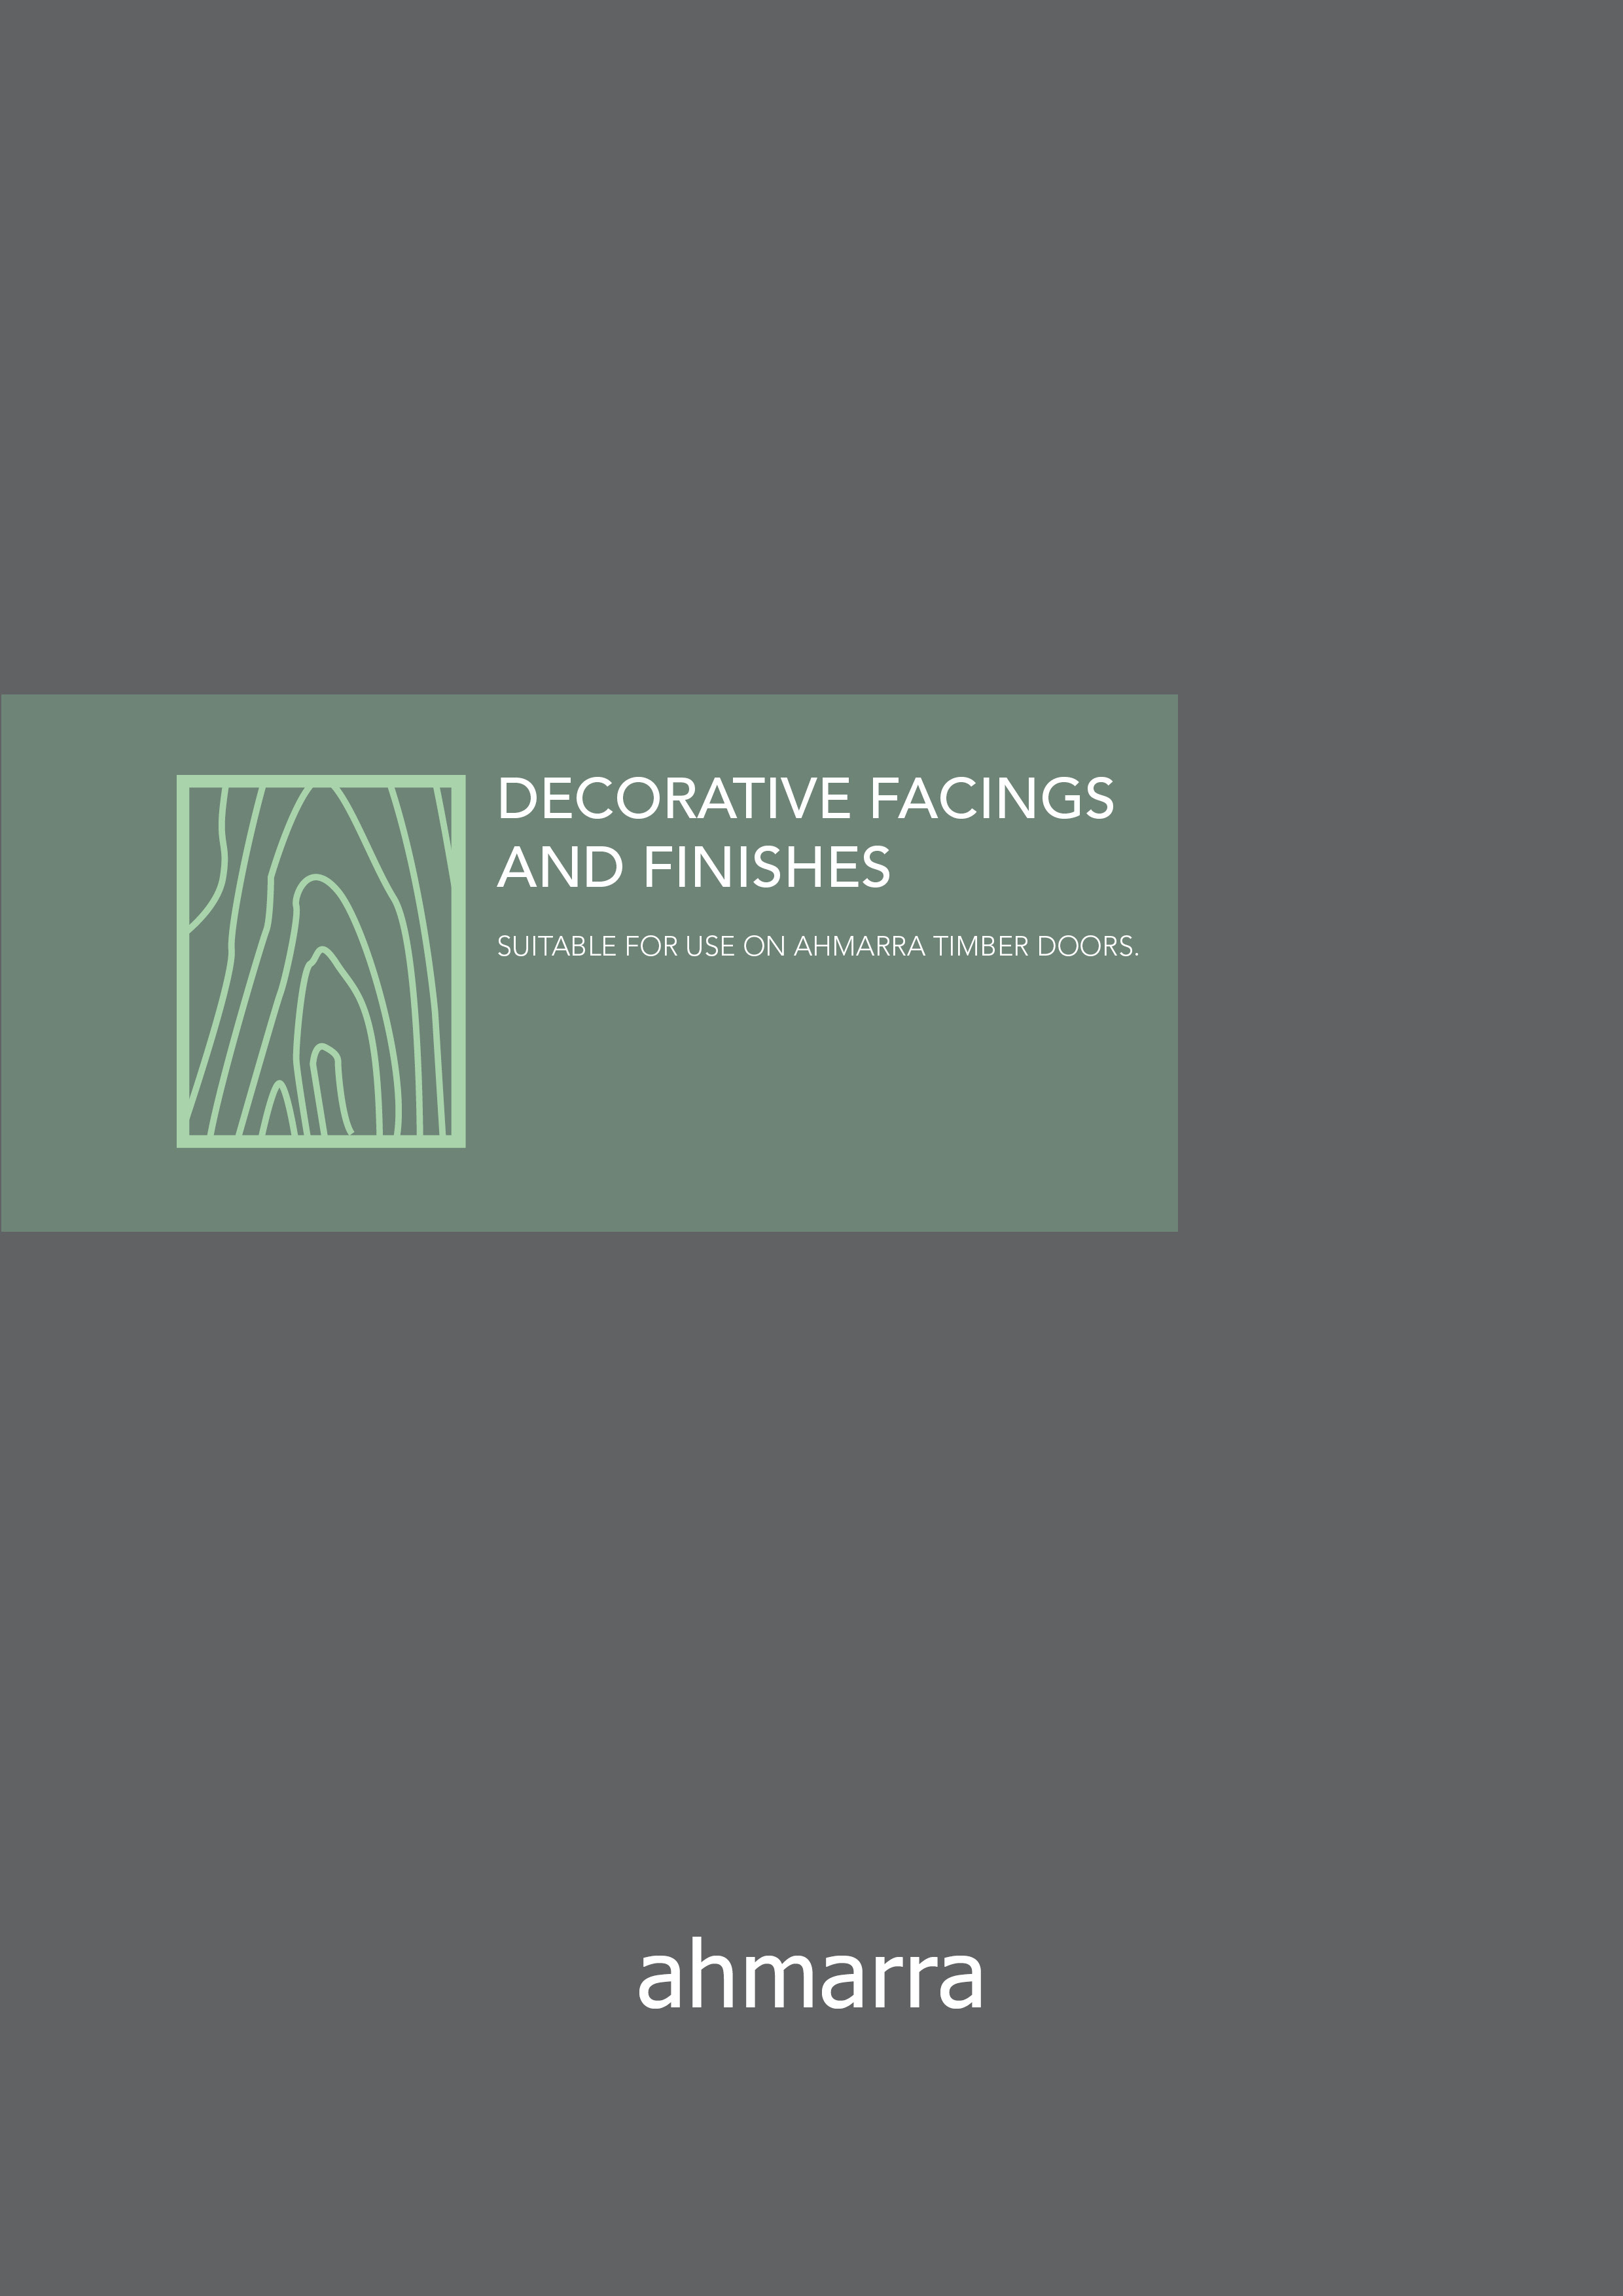 Decorative Facings and Finishes Brochure   Ahmarra Door Solutions